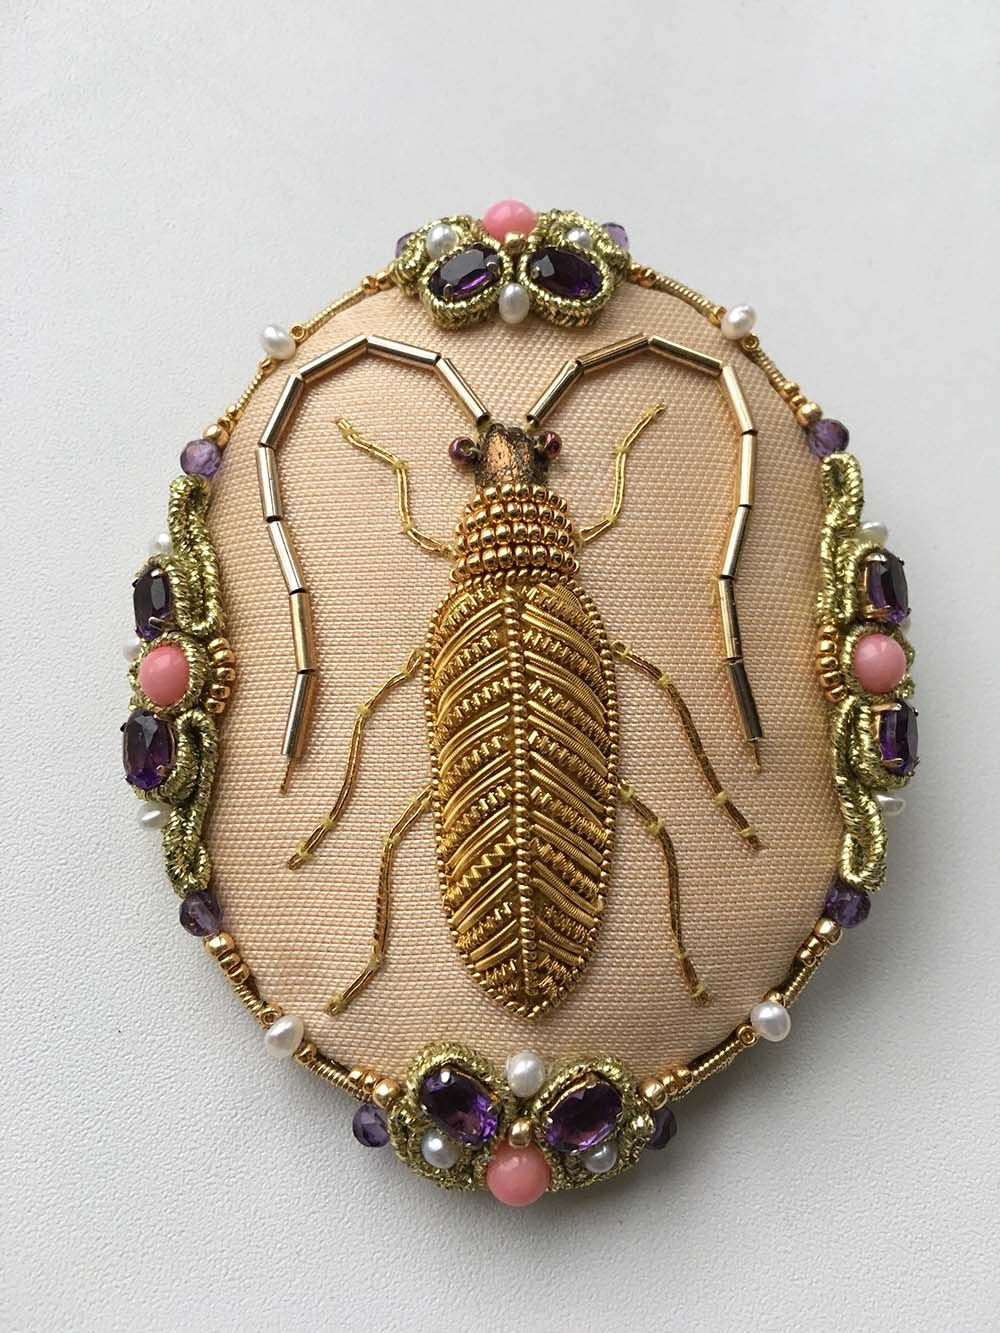 Goldwork embroidery beetle done by Larissa Borodich, design by Jane Nicholas. Brooch made by Olesya Bryutova.